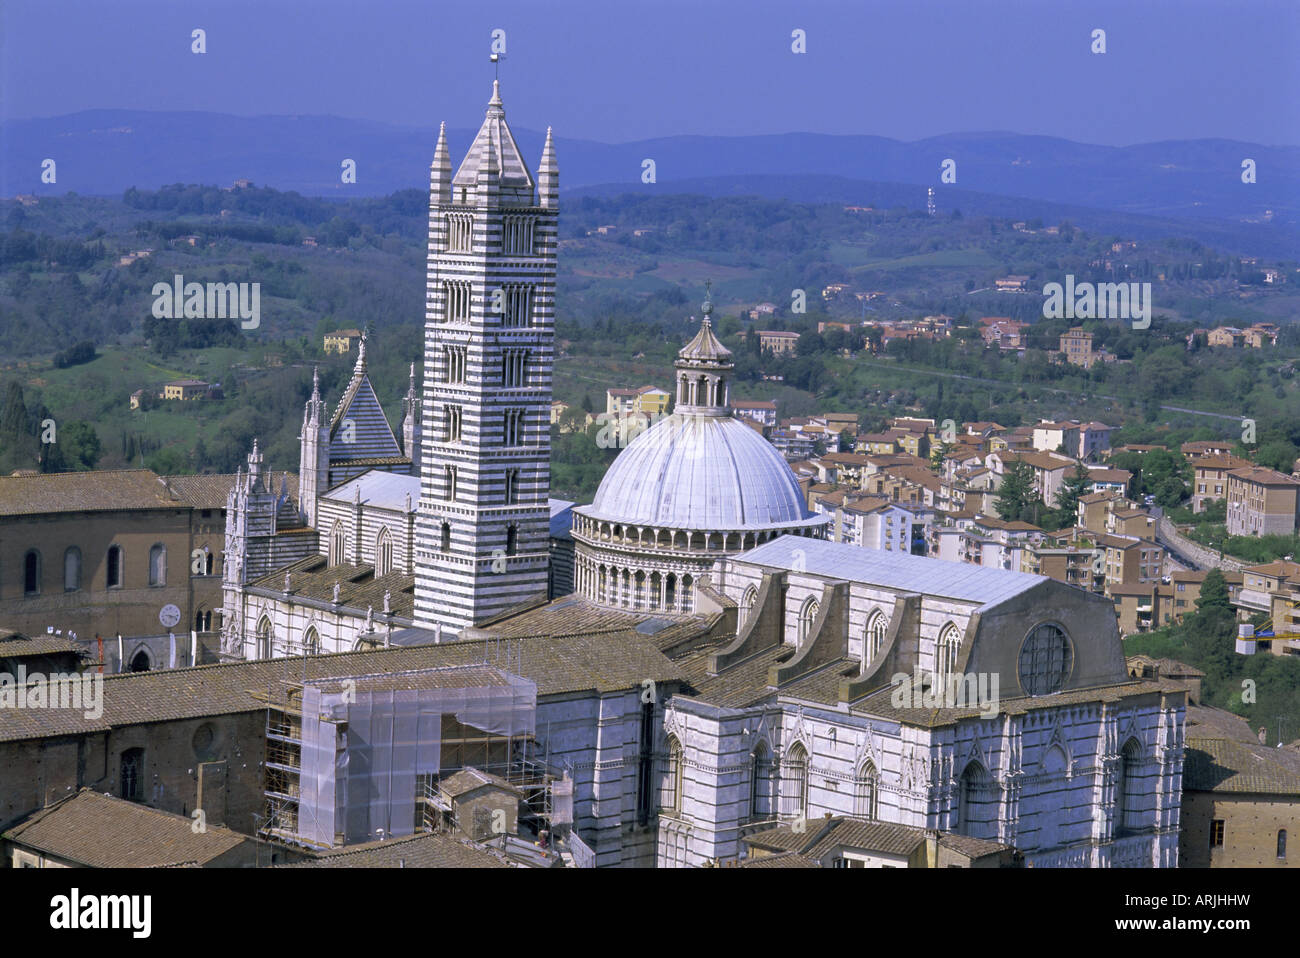 The Duomo (Cathedral), Siena, UNESCO World Heritage Site, Tuscany, Italy, Europe Stock Photo